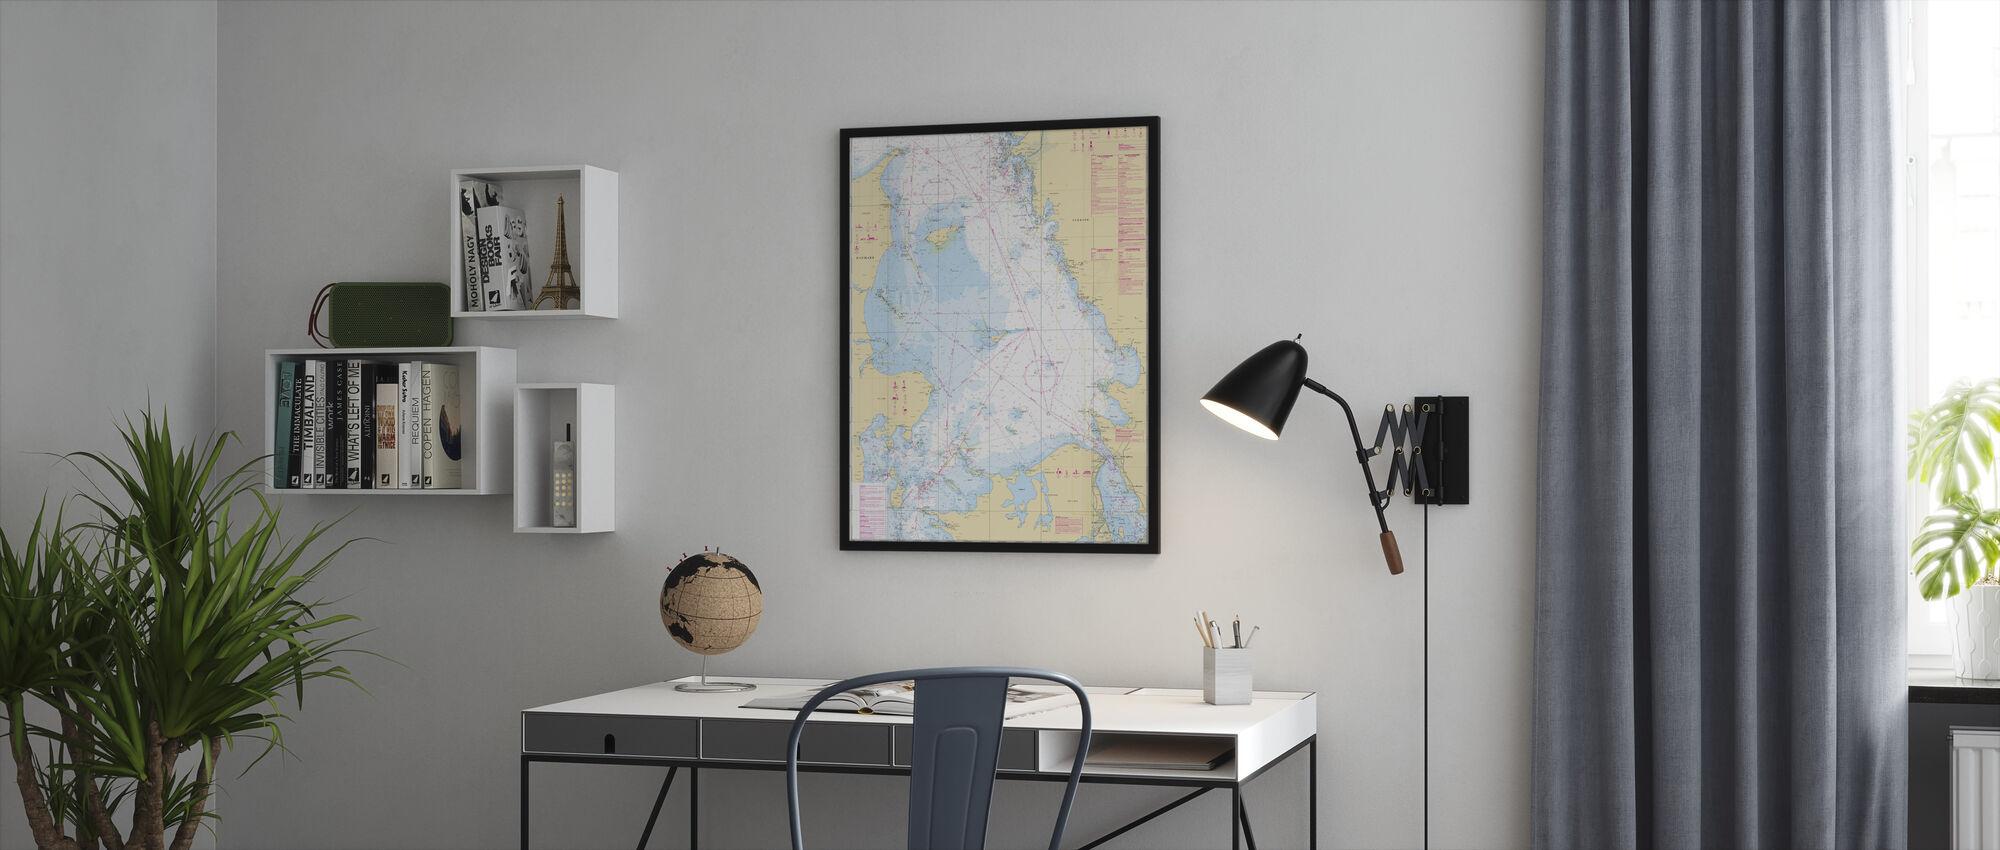 Sea Chart 92 - Kattegatt - Framed print - Office